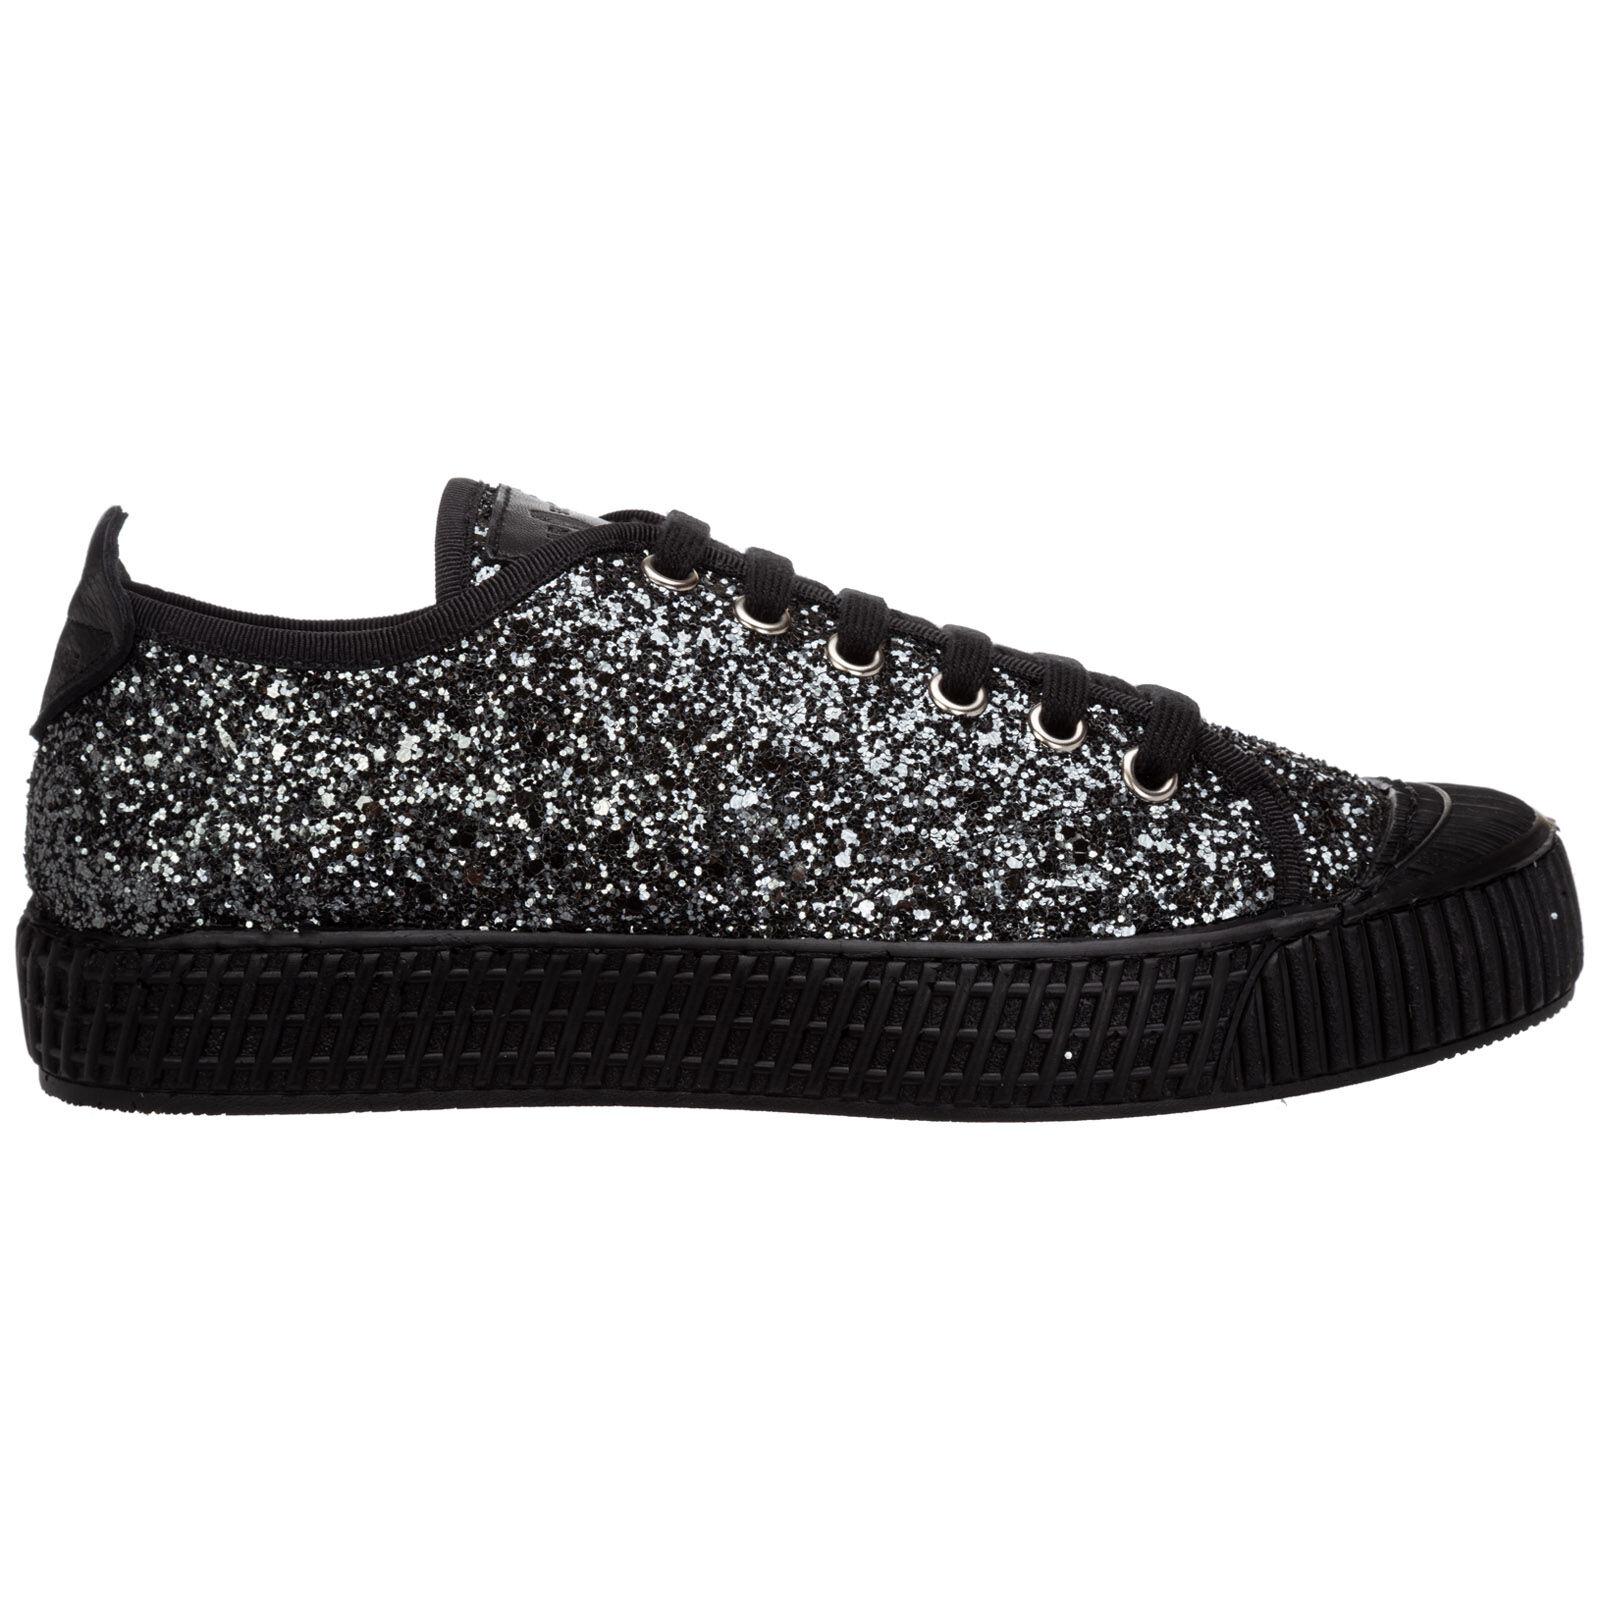 Car Shoe Women's shoes trainers sneakers  - Black - Size: 37.5